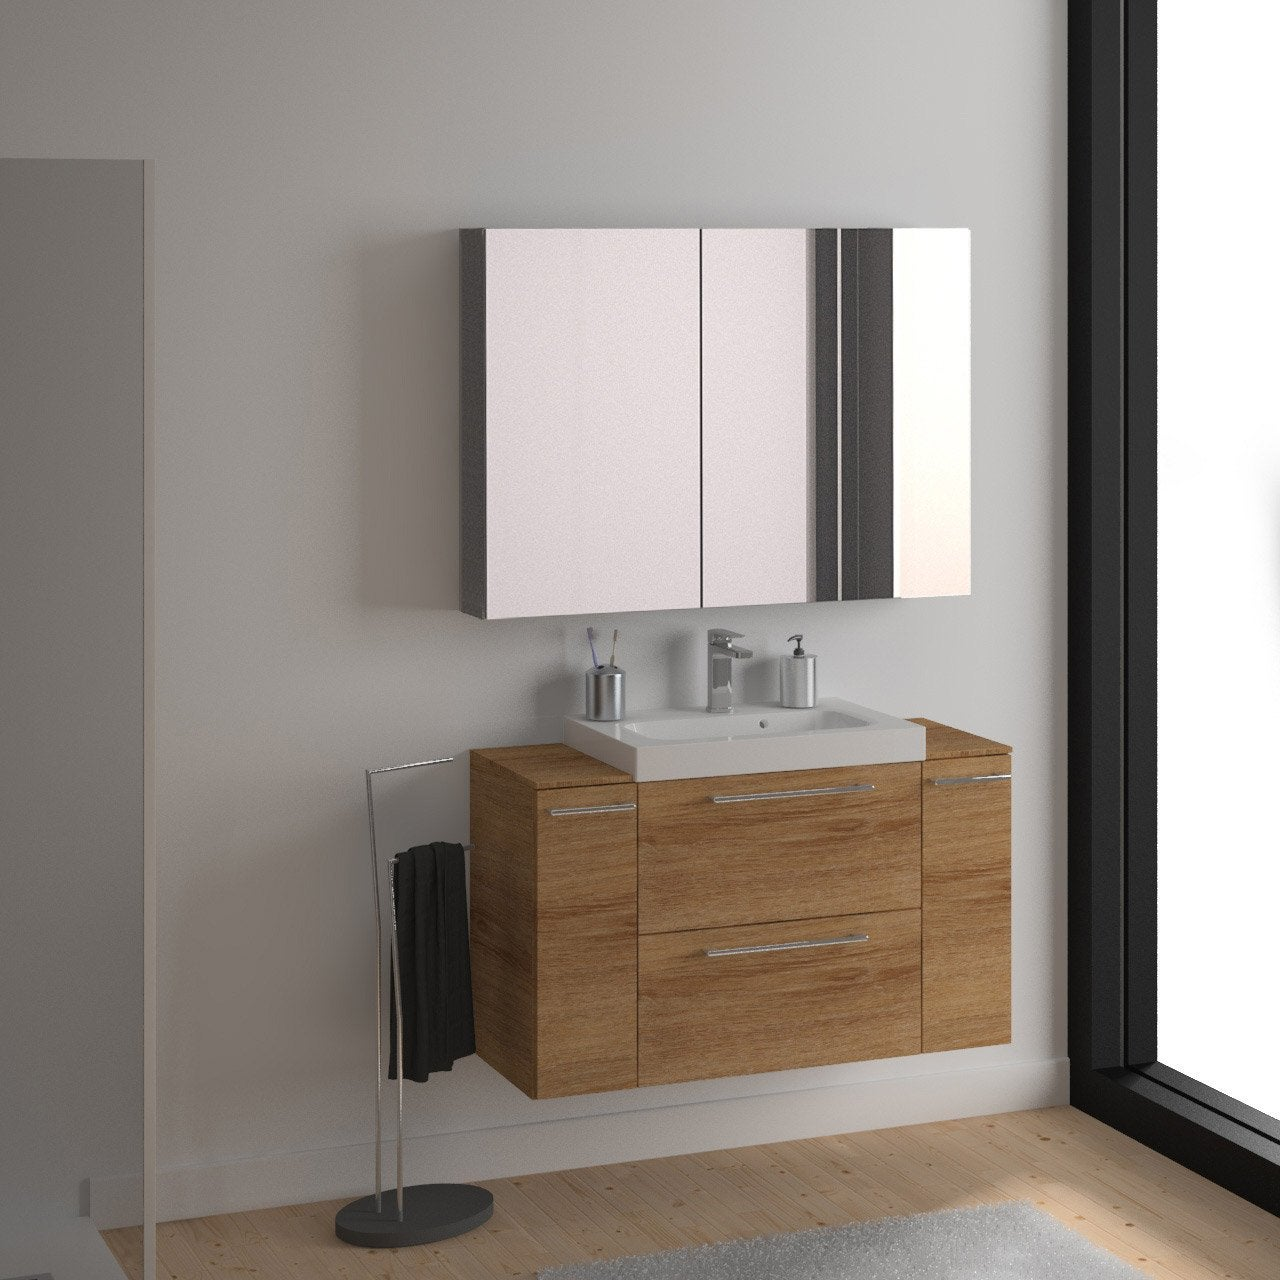 Meuble de salle de bains remix imitation ch ne 61x48 5 cm for Meuble salle de bain teck leroy merlin